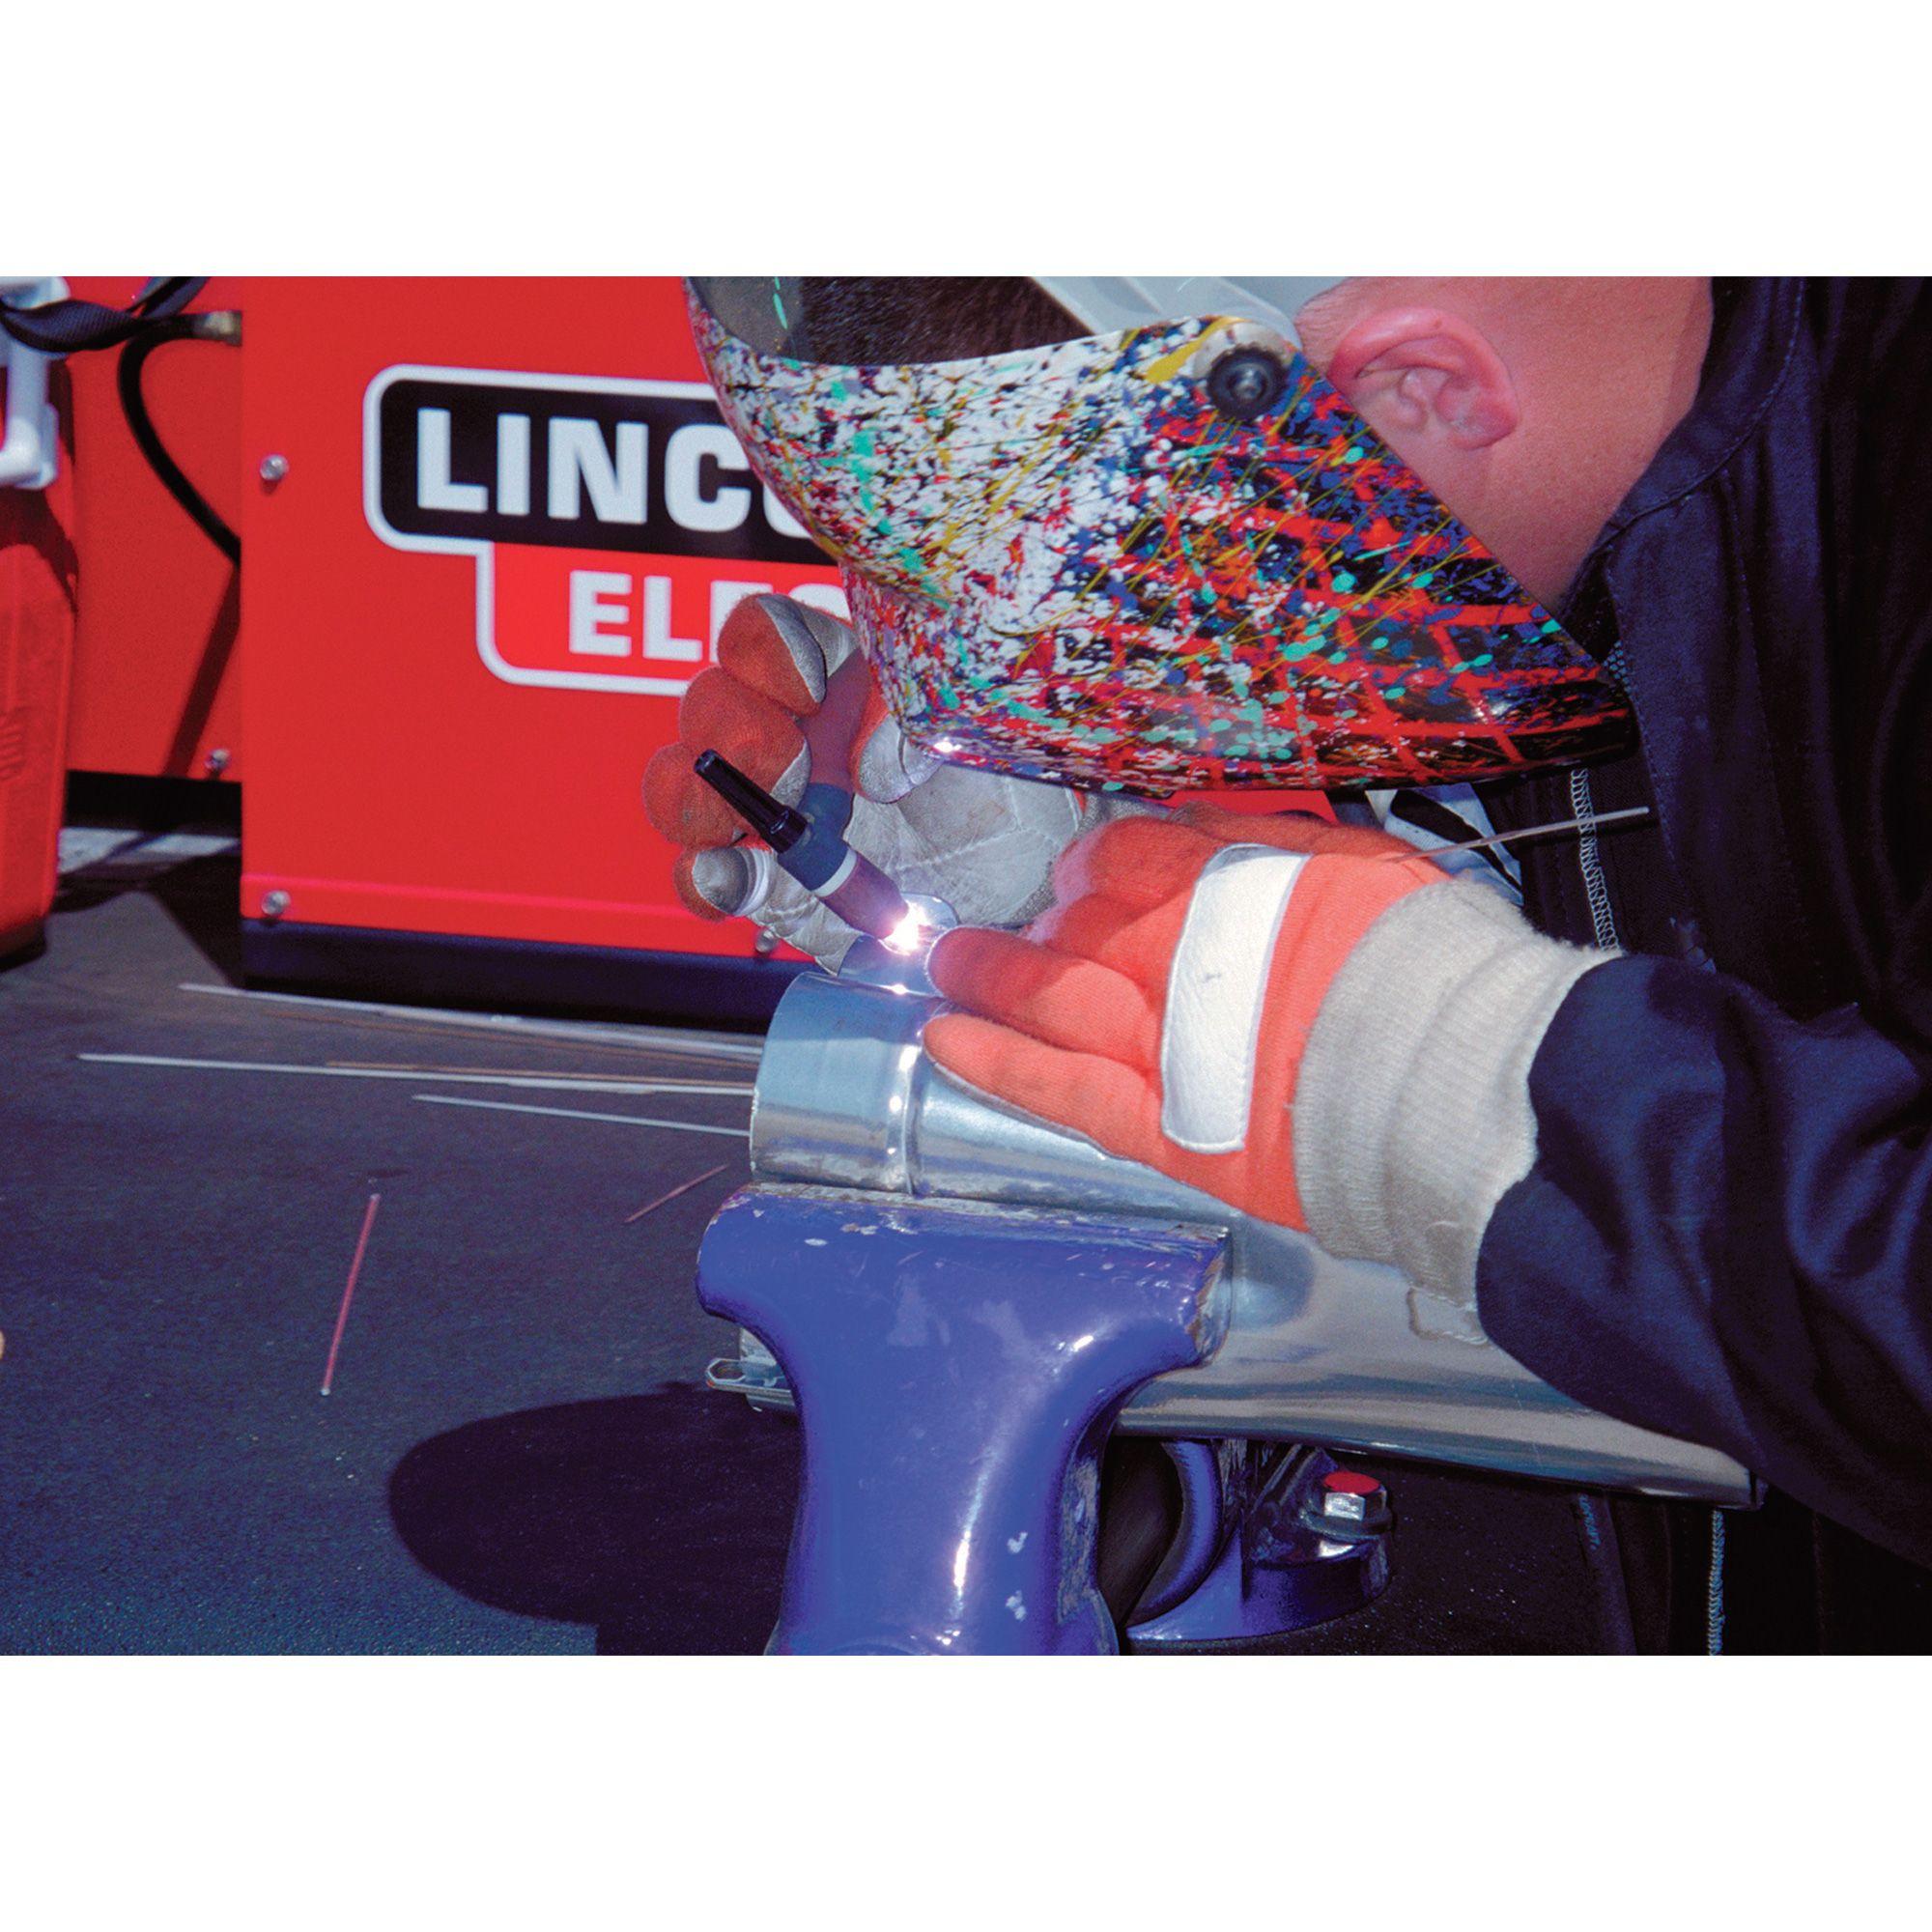 Lincoln Electric Precision Tig 225 Ac Dc Tig Welder Ready Pak 230v Model K2535 1 Tig Welder Tig Welding Arc Welders